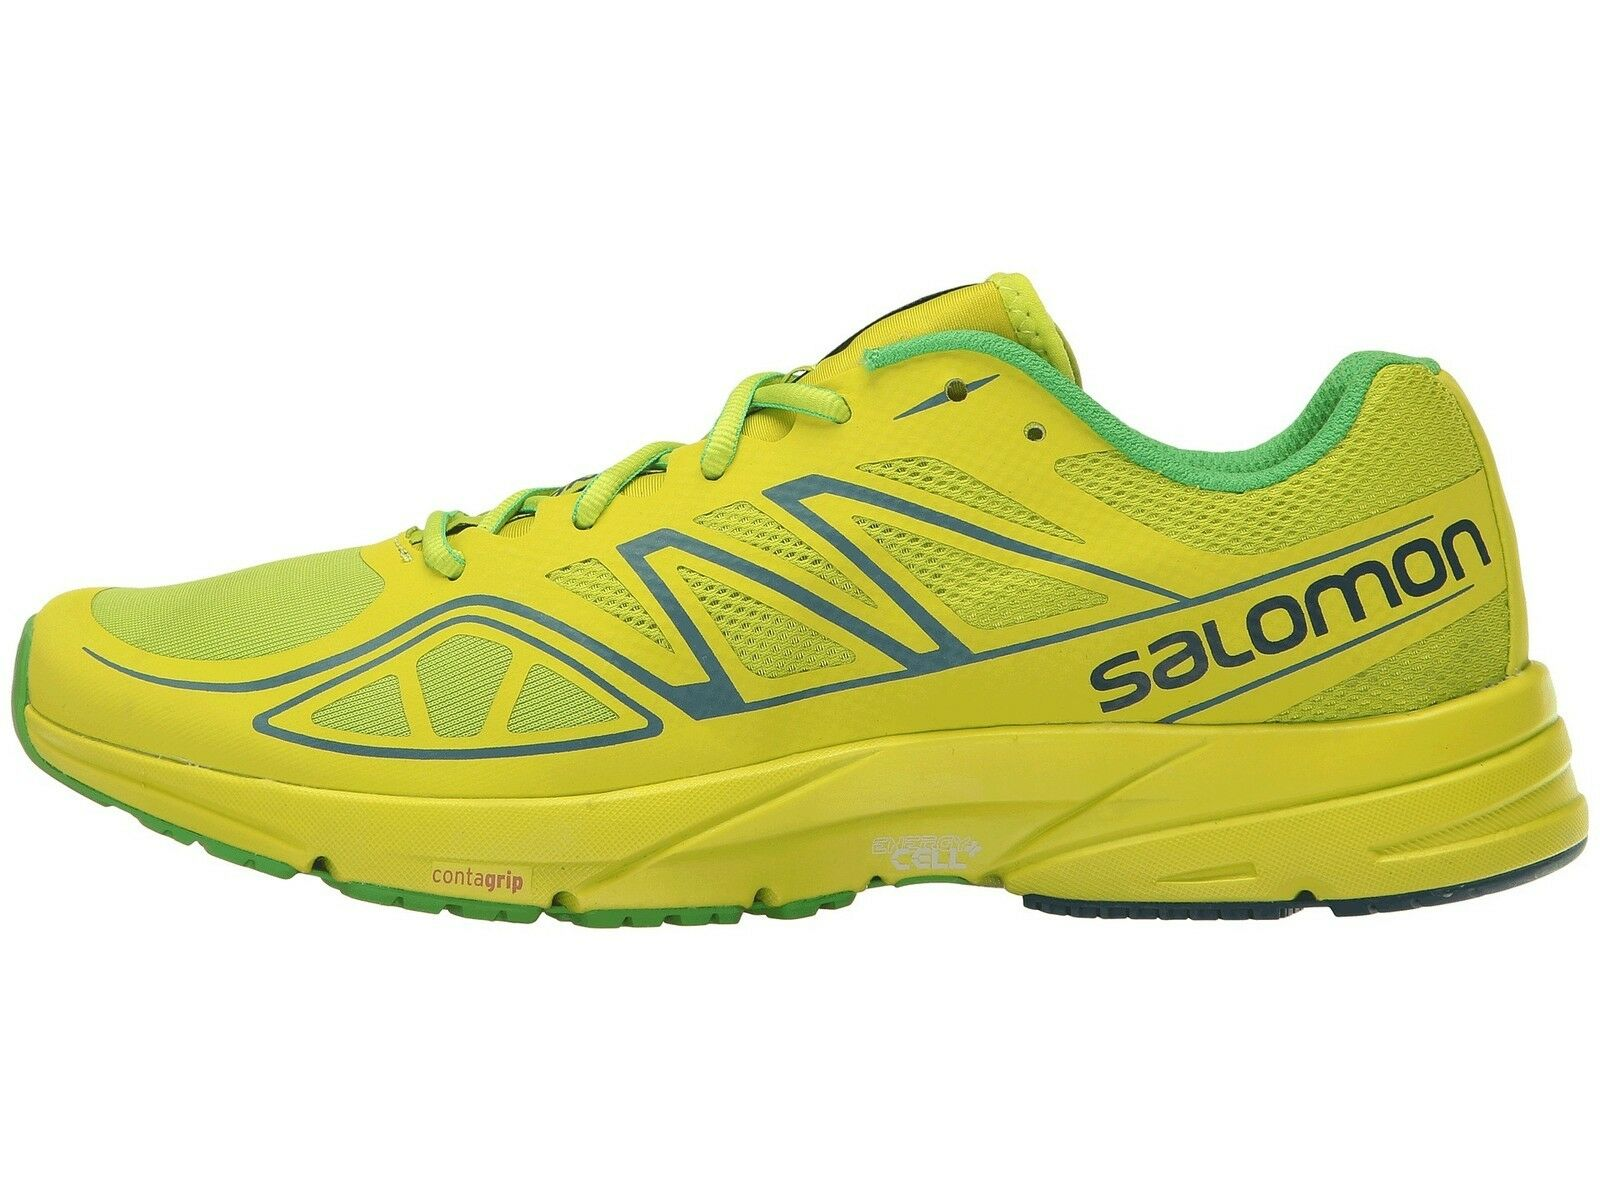 Salomon Sonic Aero señores mentecato runningschuh (Lime-verde) -  nuevo